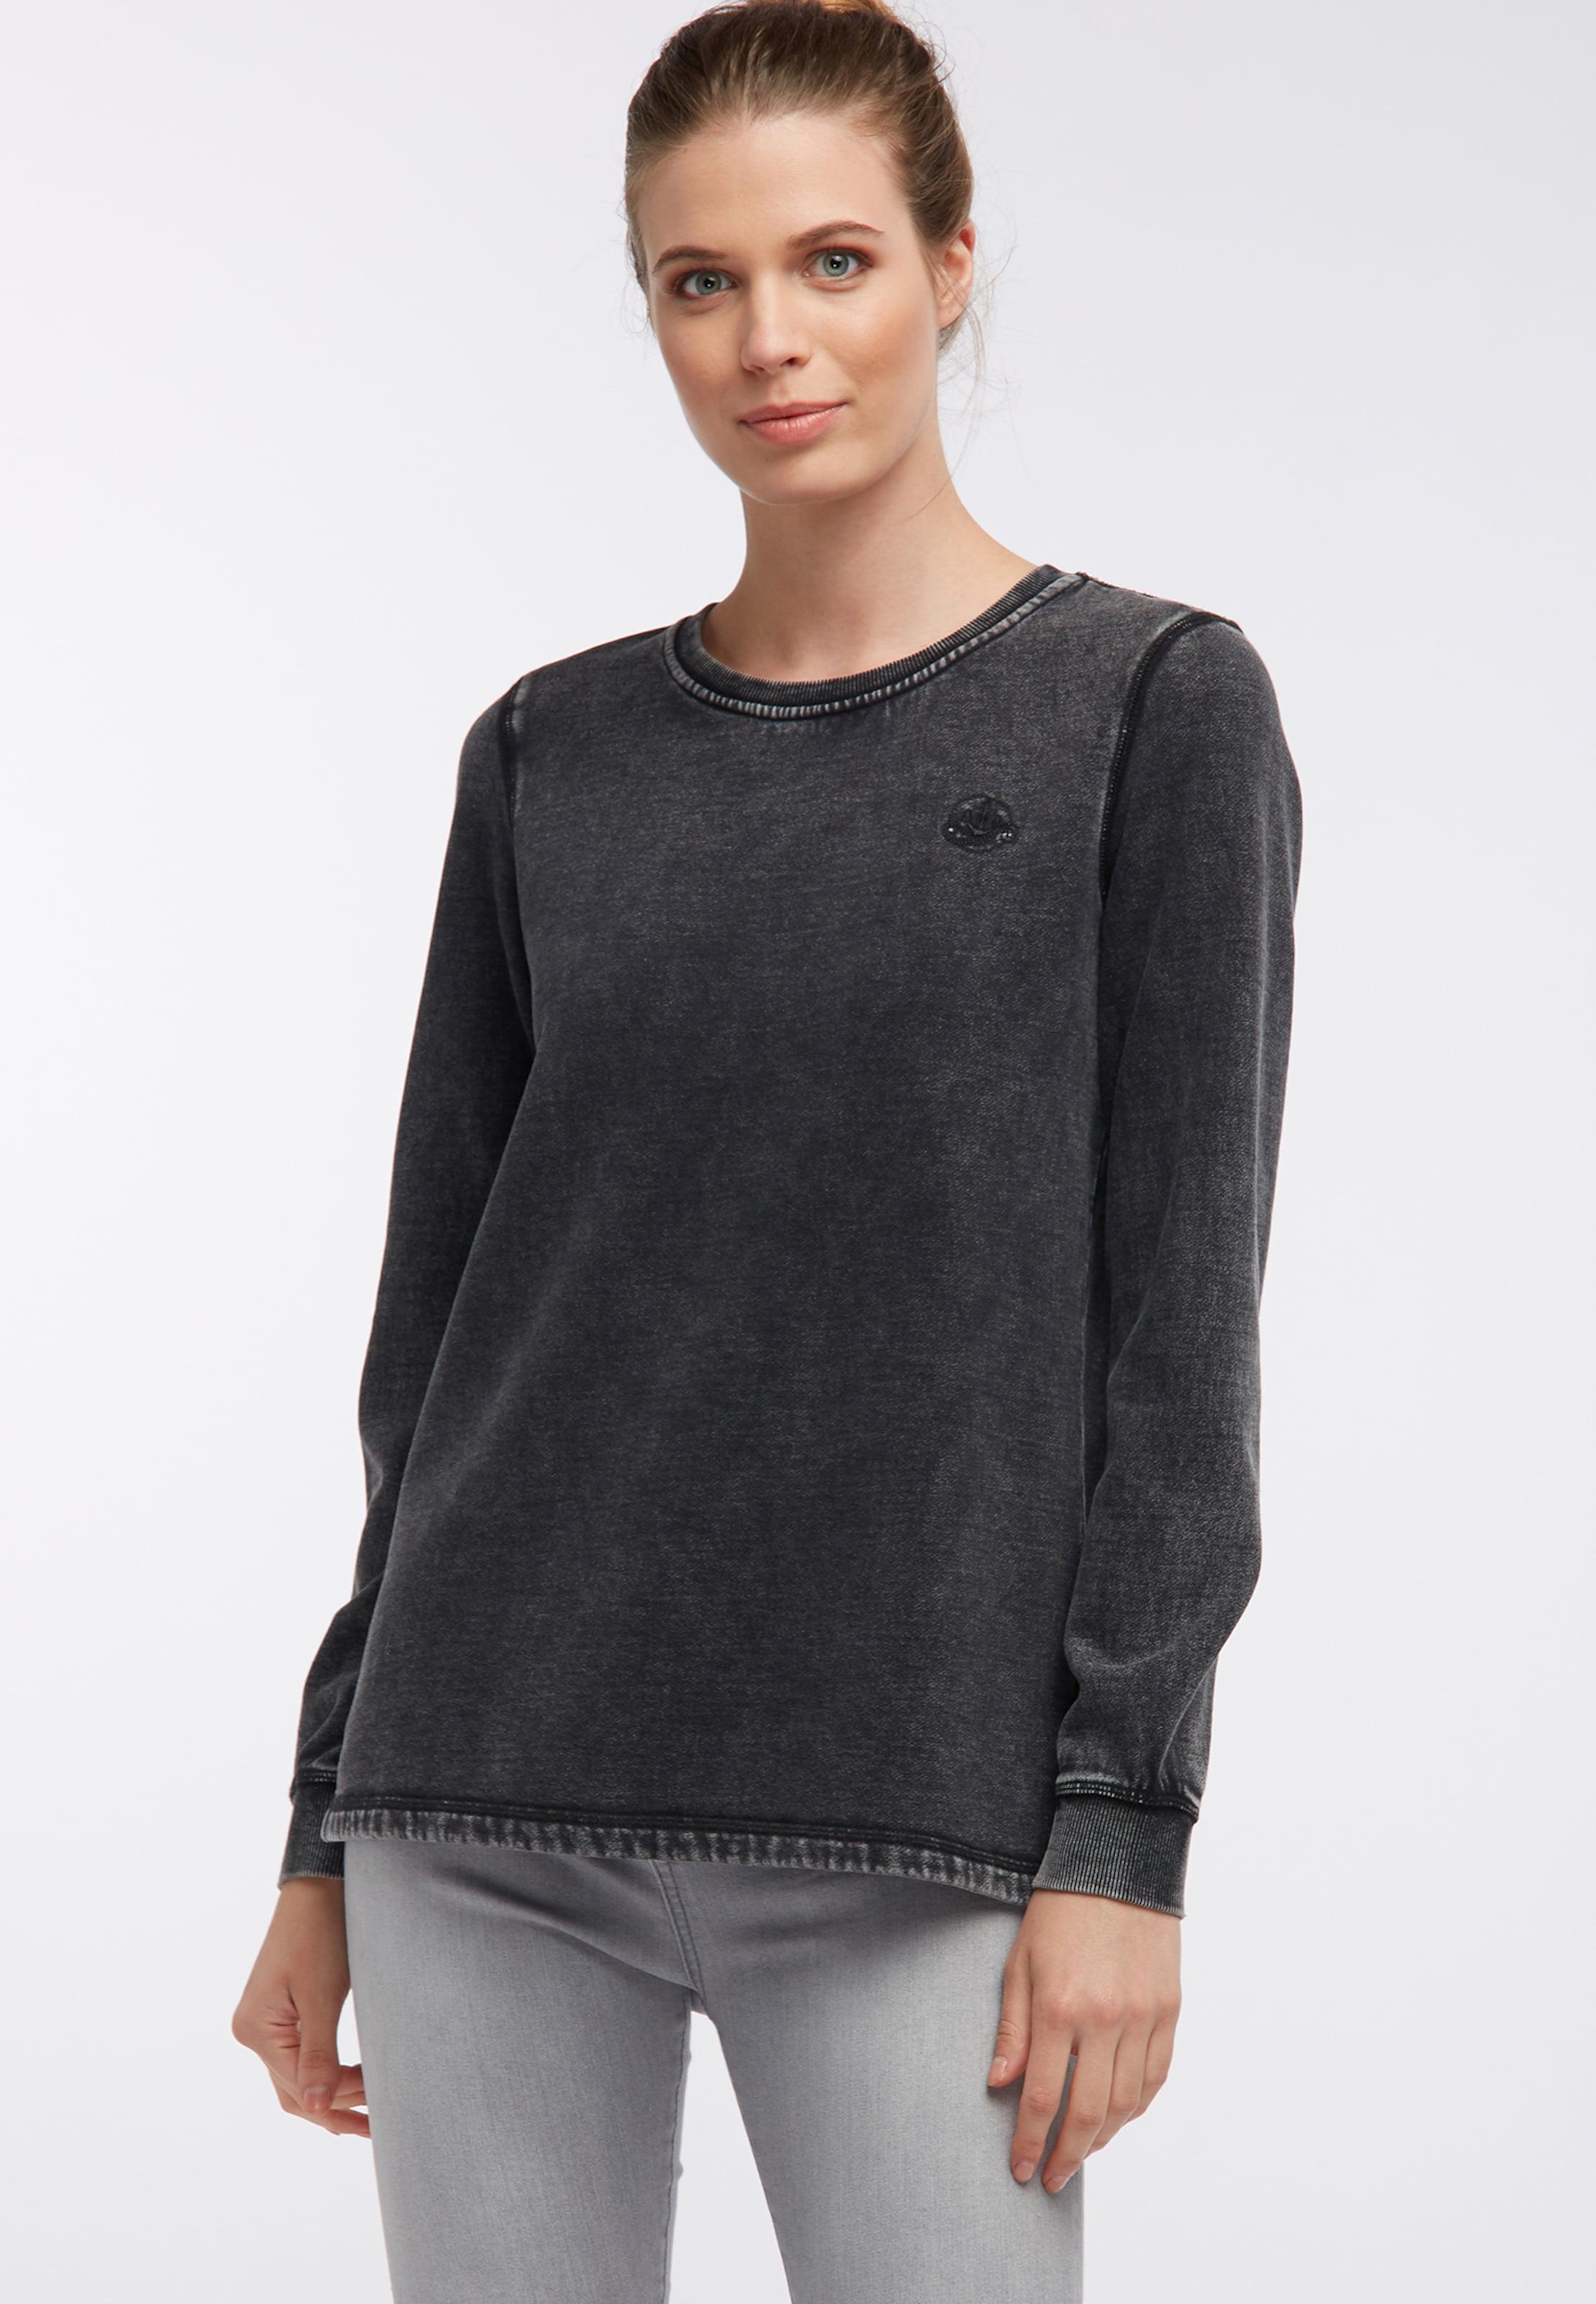 Sweatshirt In Dreimaster Sweatshirt In Schwarz Dreimaster Dreimaster Schwarz Sweatshirt SzpGUVqM